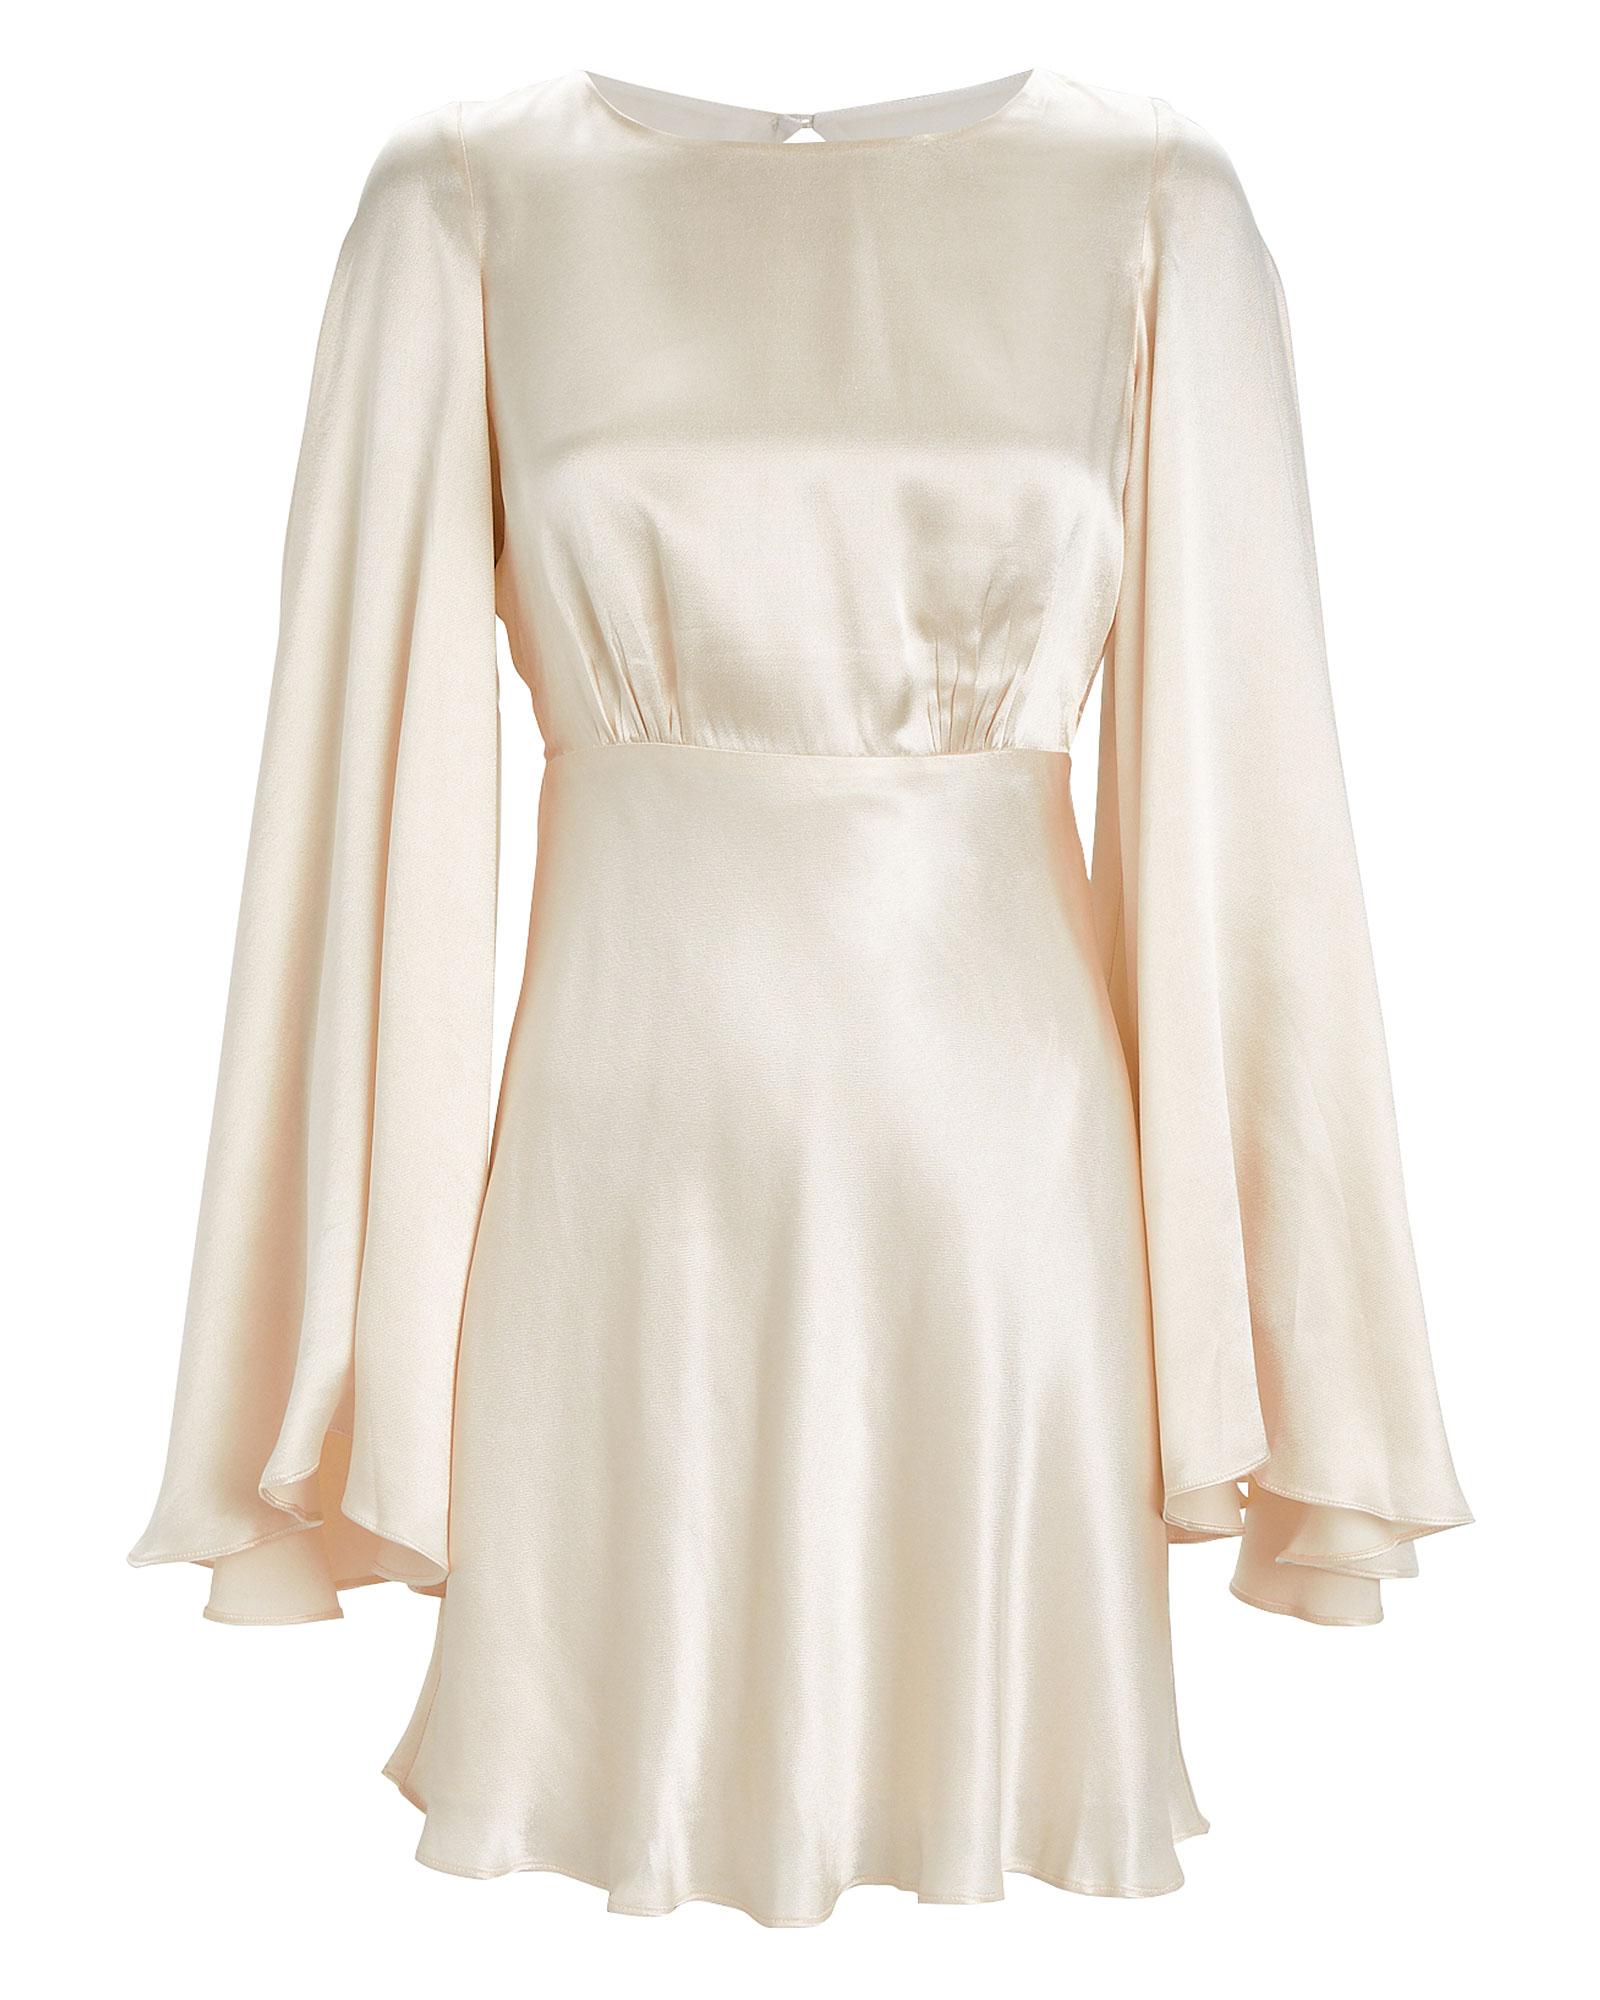 Jefferson Backless Satin Mini Dress by Shona Joy